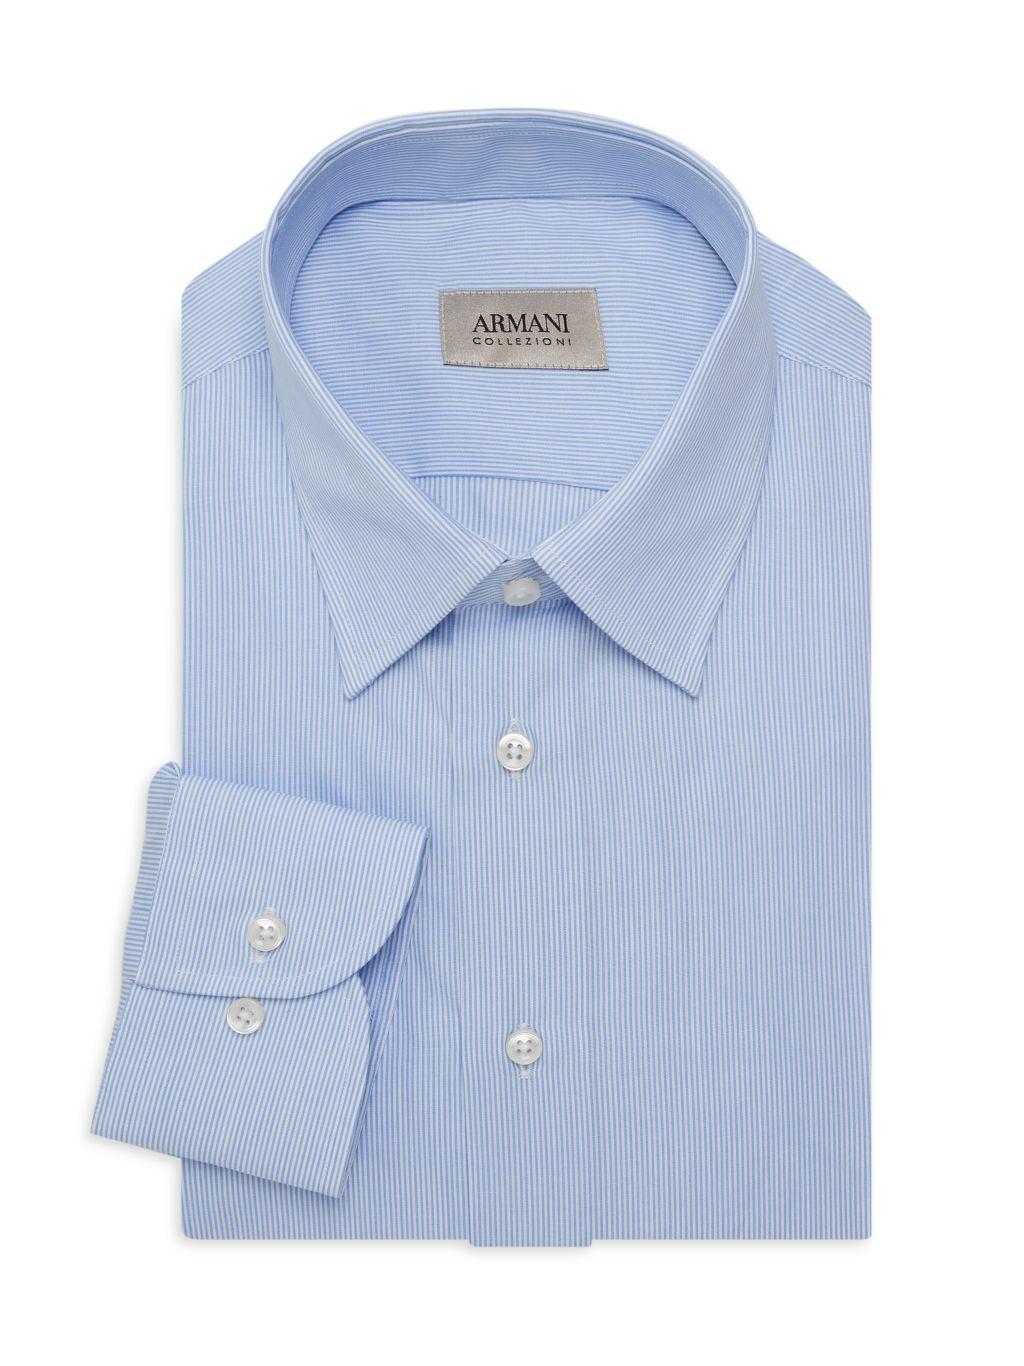 Armani Collezioni Hairline Stripe Dress Shirt